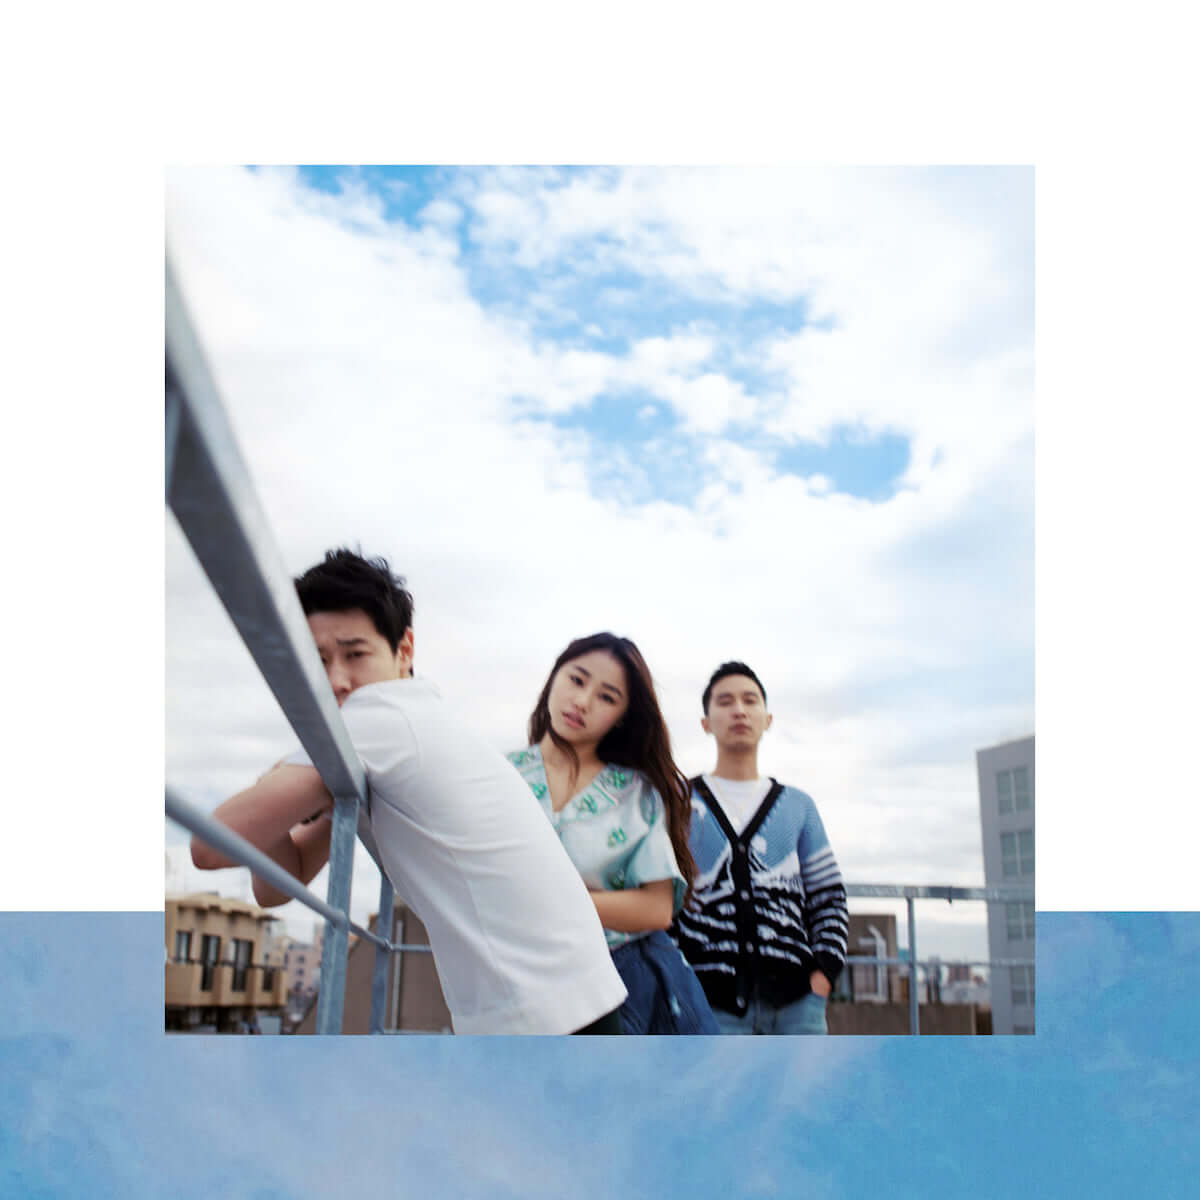 RIRI、新作EPを5月22日にリリース|KEIJU&小袋成彬コラボ曲「Summertime」本日配信スタート music190417_riri_main-1200x1200